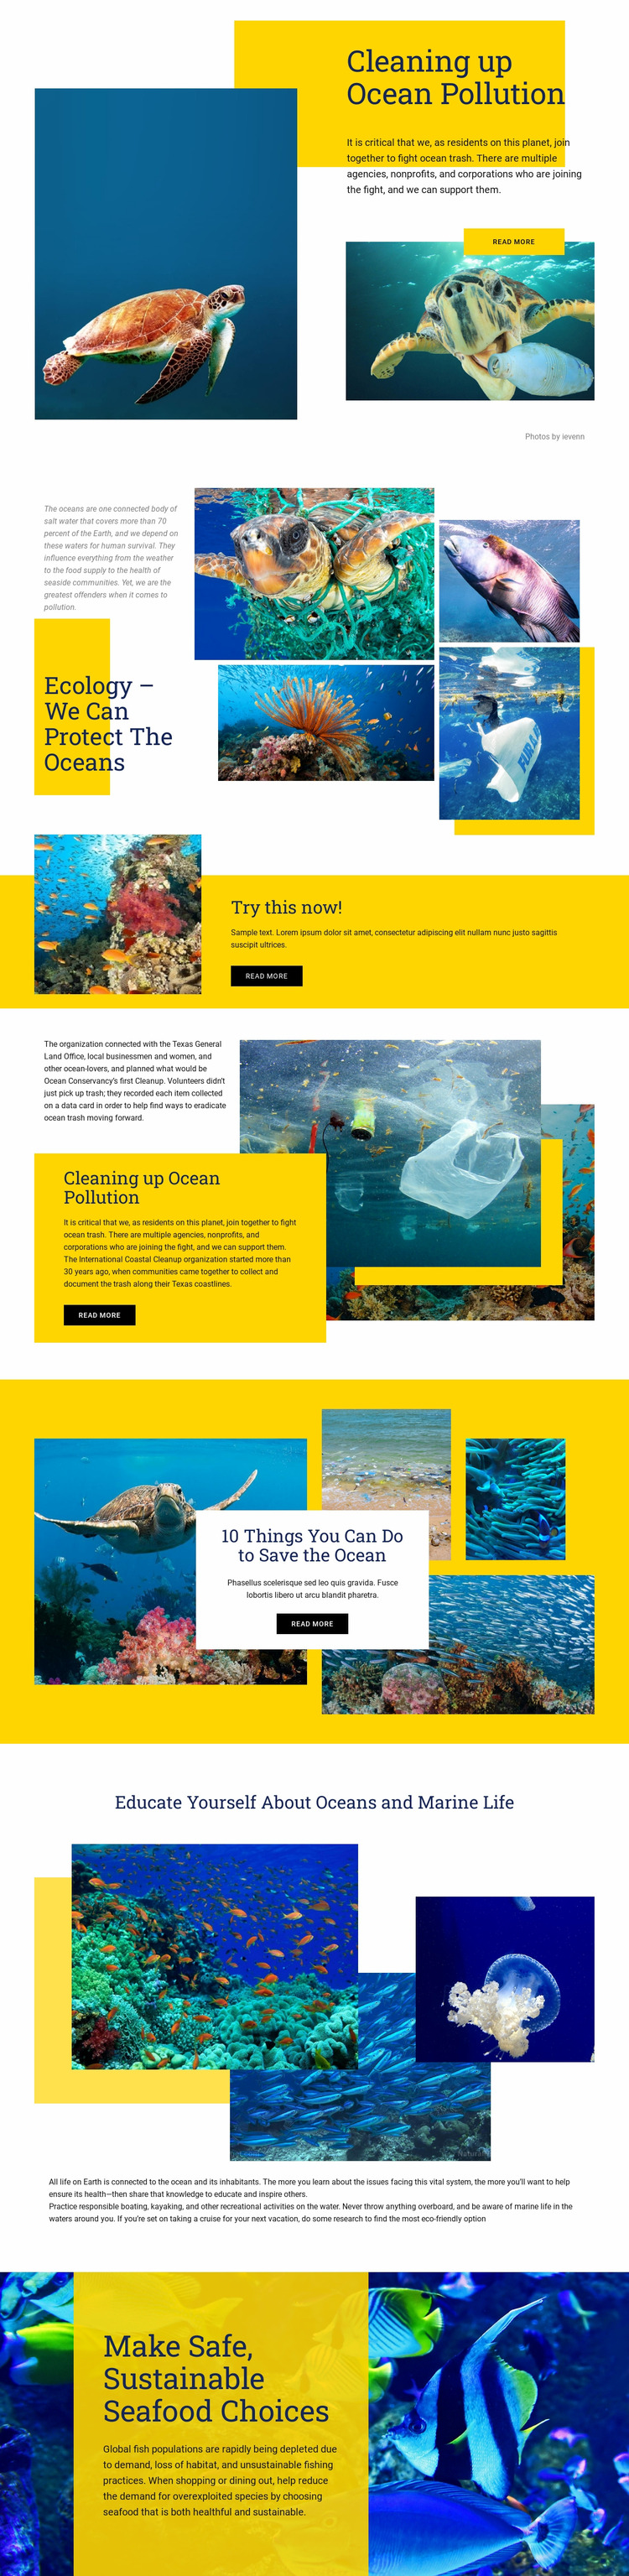 Protect The Oceans WordPress Website Builder